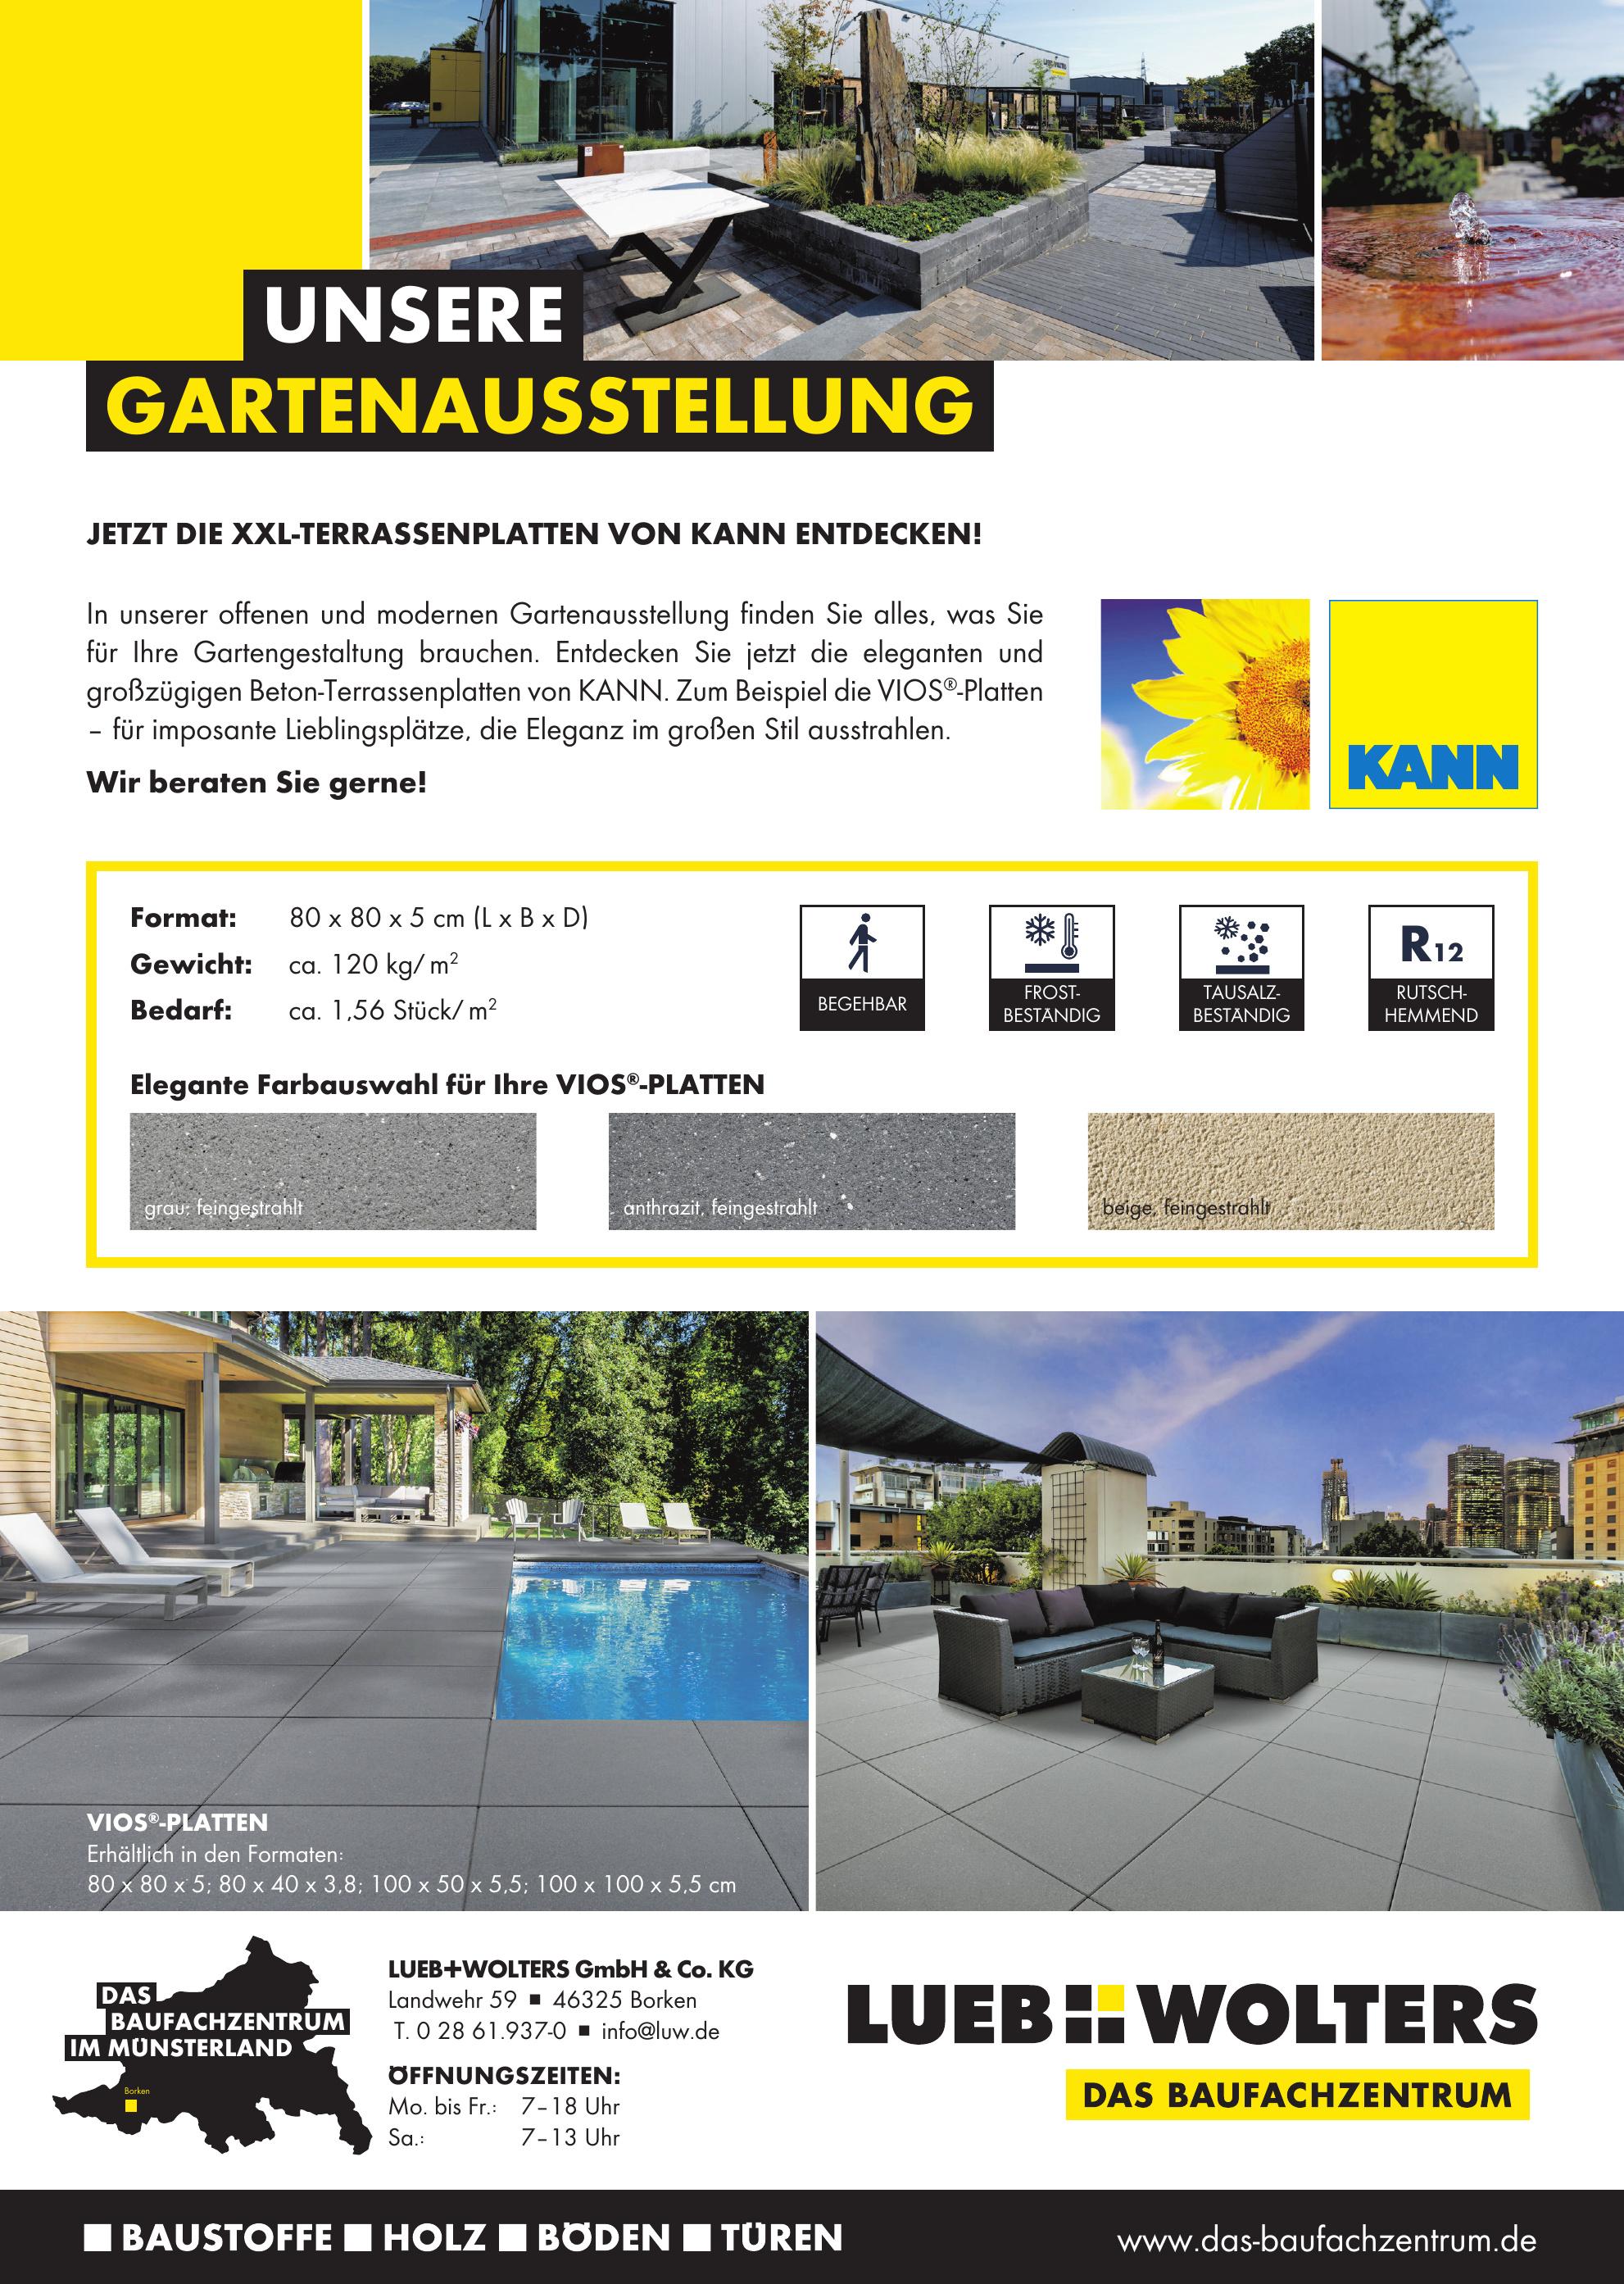 LUEB+WOLTERS GmbH & Co. KG